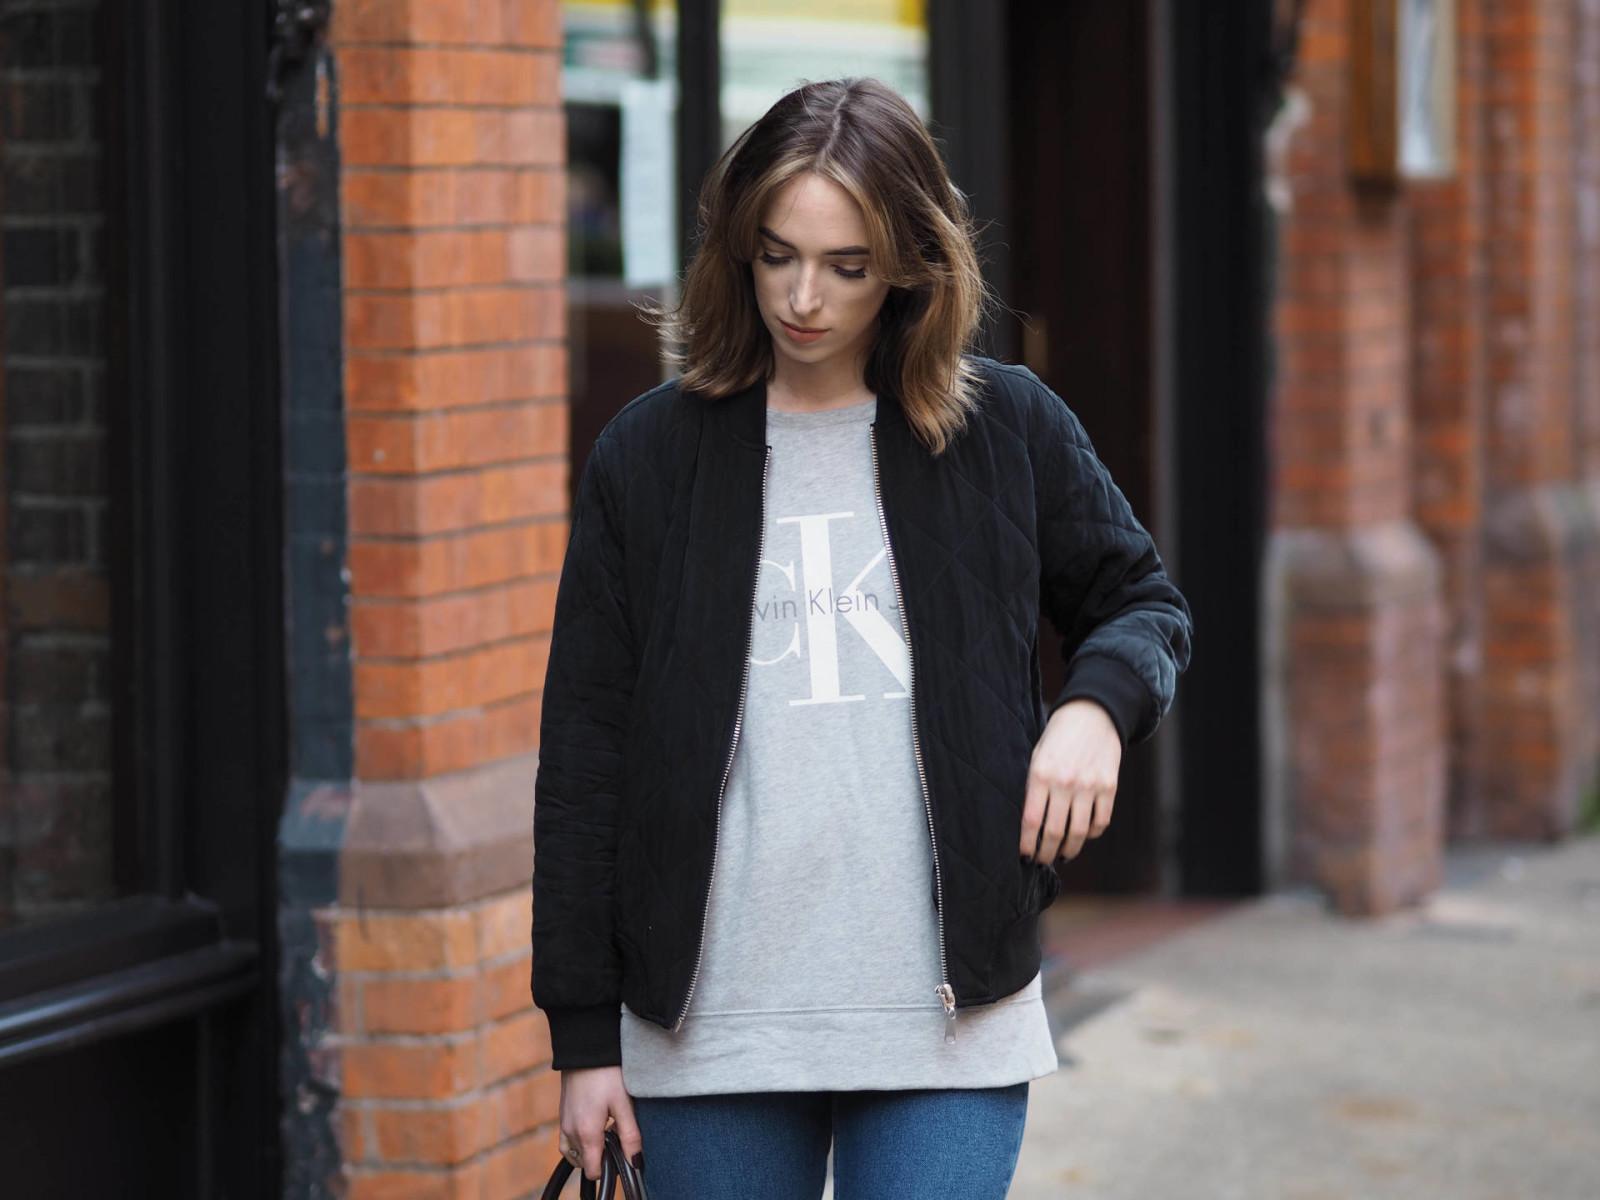 Style Diary: Fresh Kicks, Comfy Sweaters